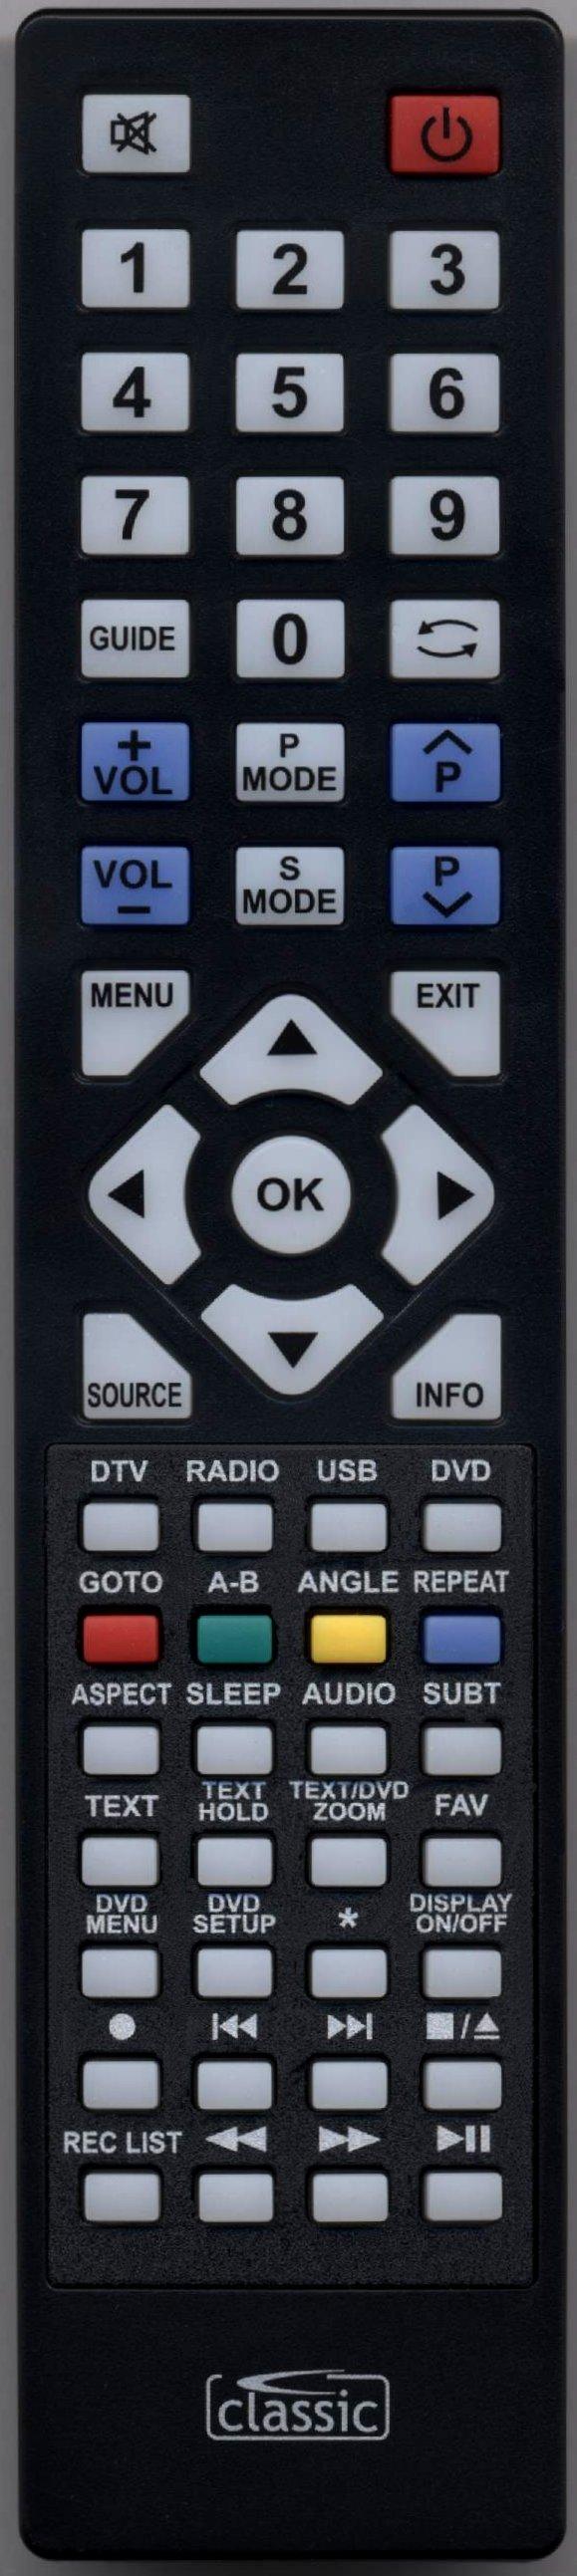 BLAUPUNKT 40/234I-GB-5B2-FHBKUP-EU Remote Control Alternative